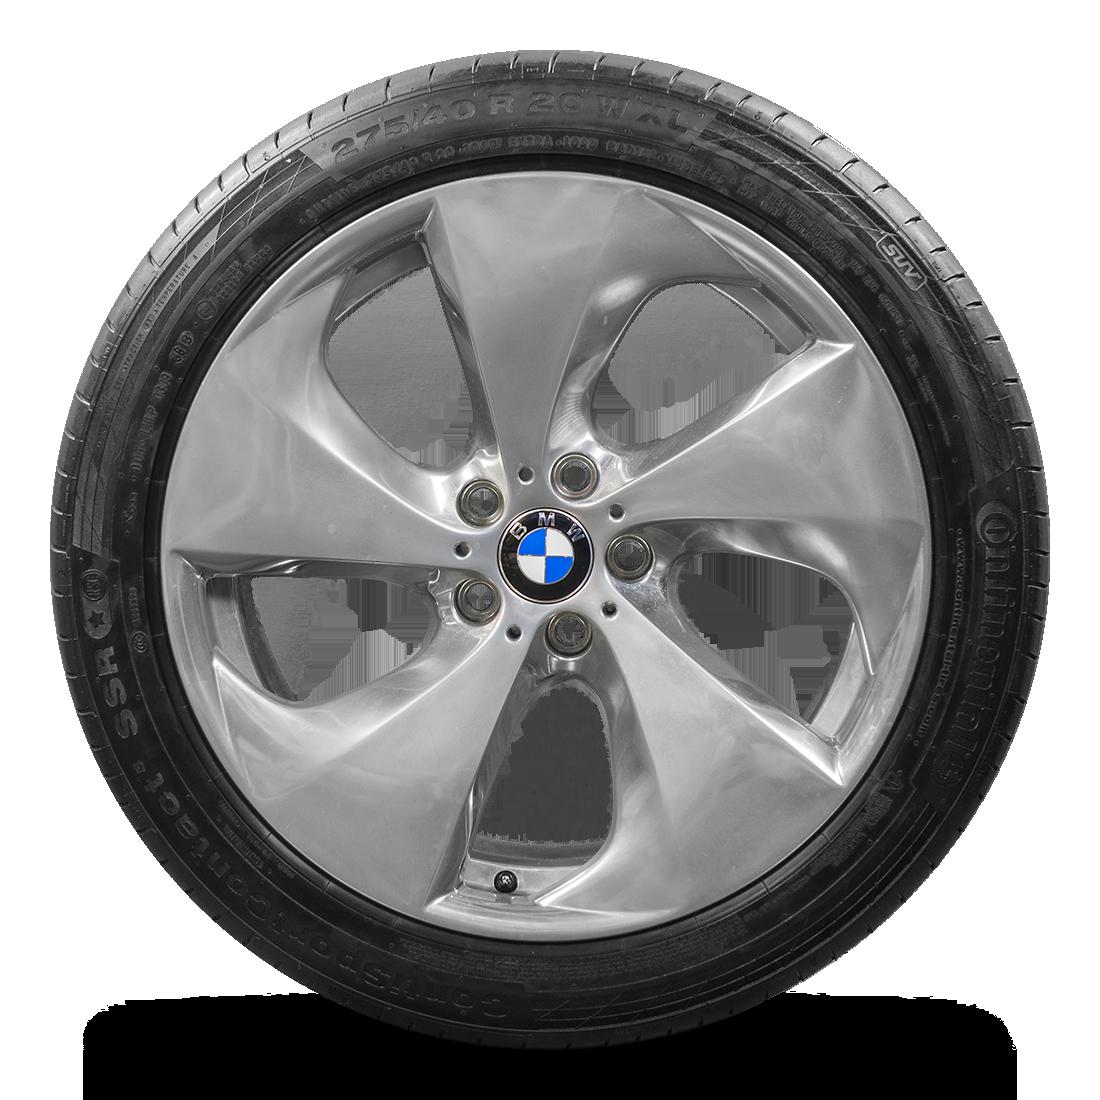 Bmw X6 Rims For Sale: 20-inch Alloy Wheels BMW X6 E71 F16 X5 E70 F15 Streamline